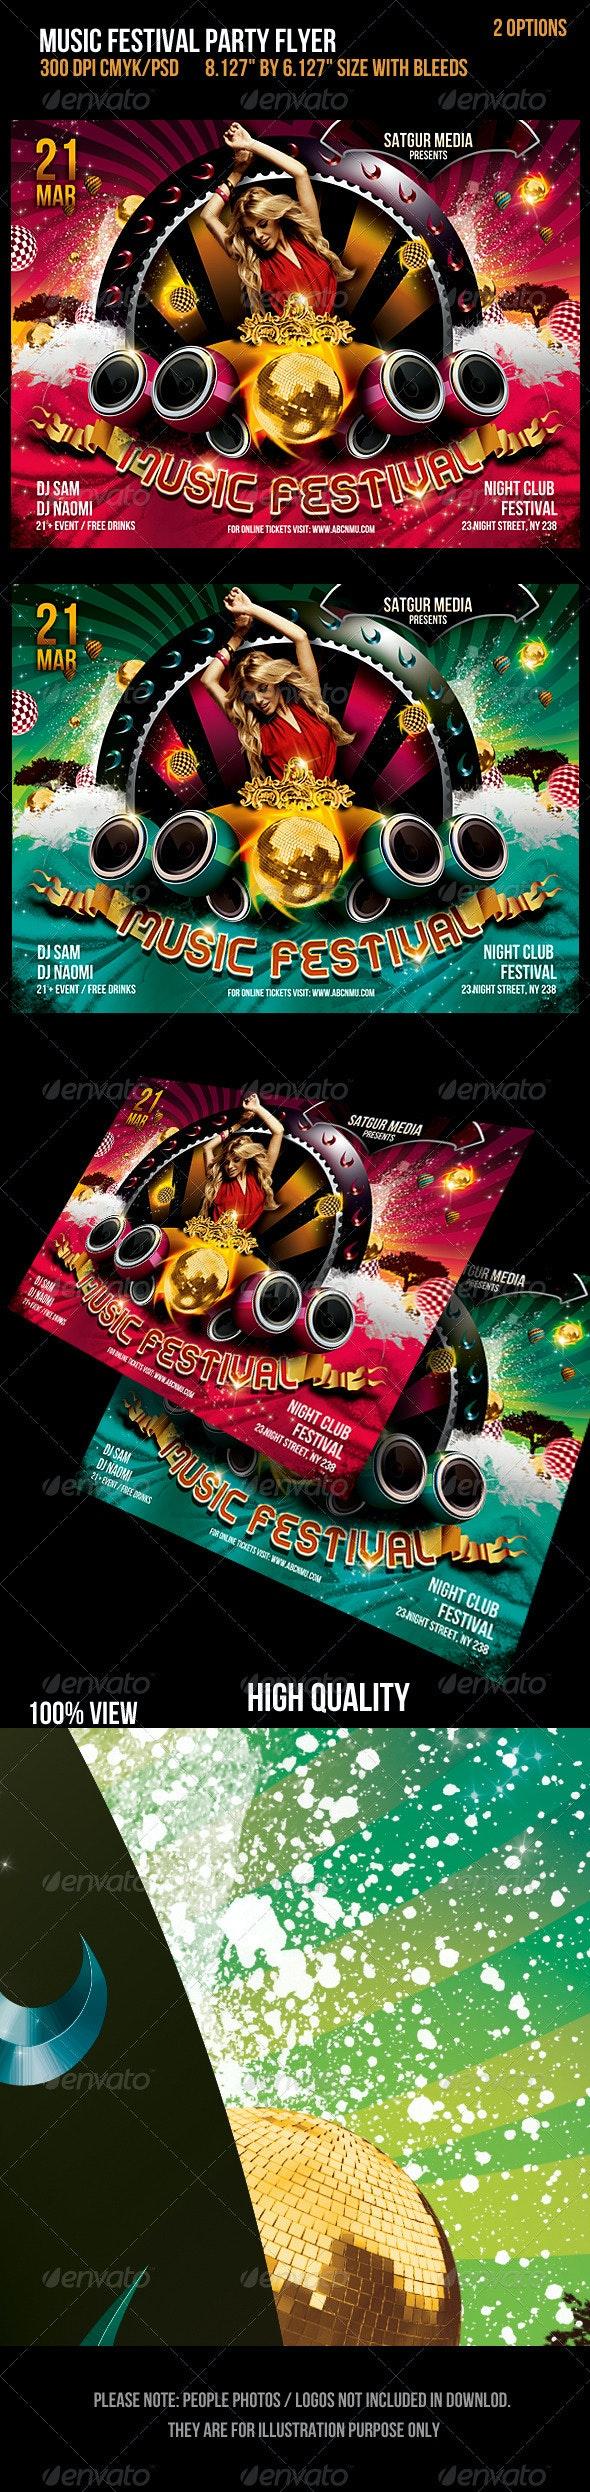 Music Festival Dance Party Flyer - Flyers Print Templates